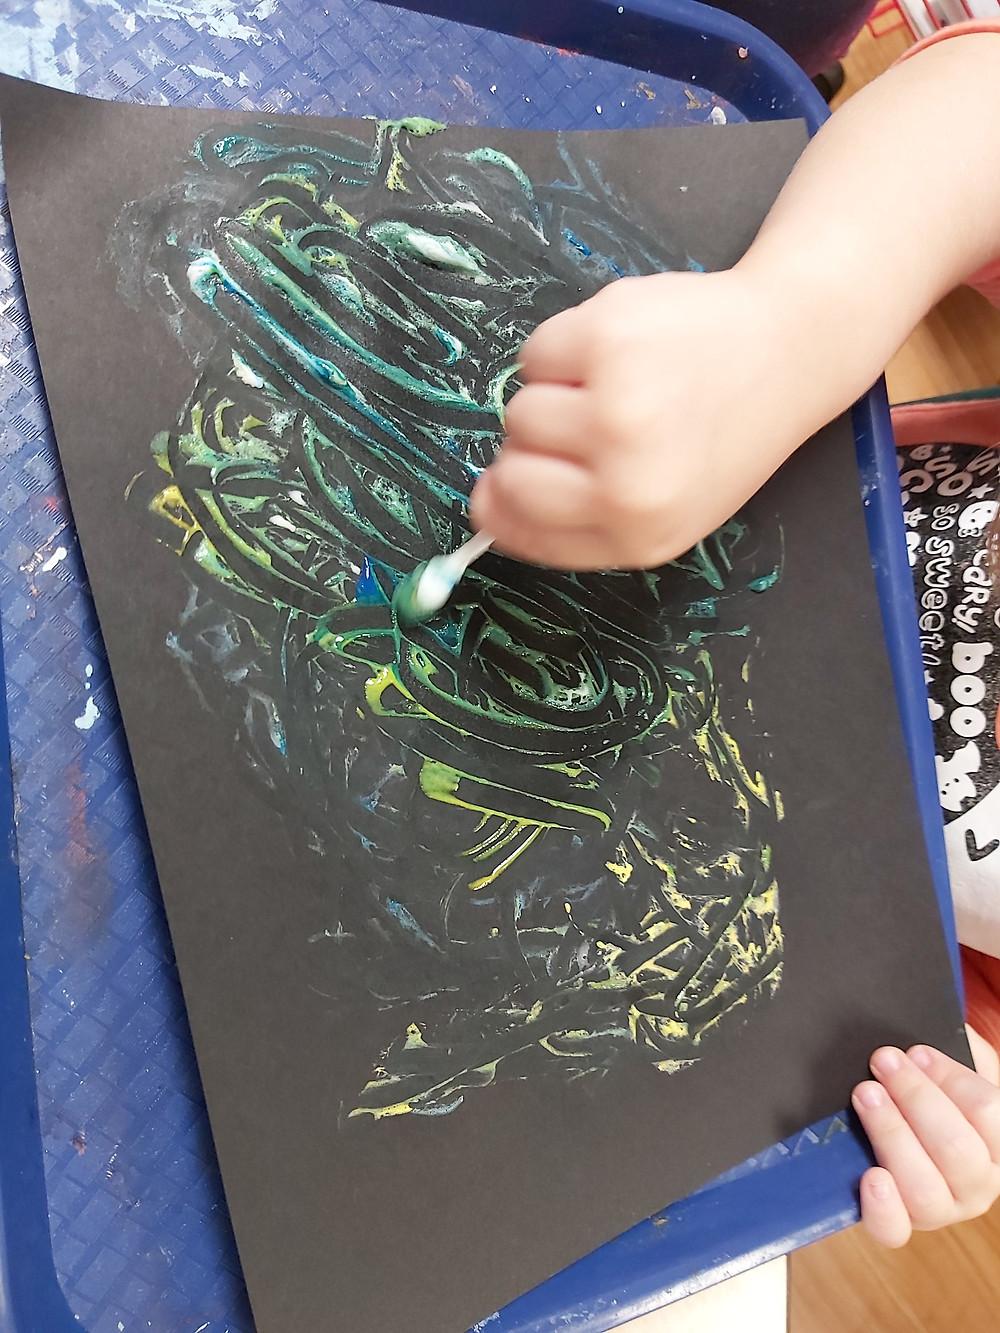 preschool painting with eyeshadow applicator